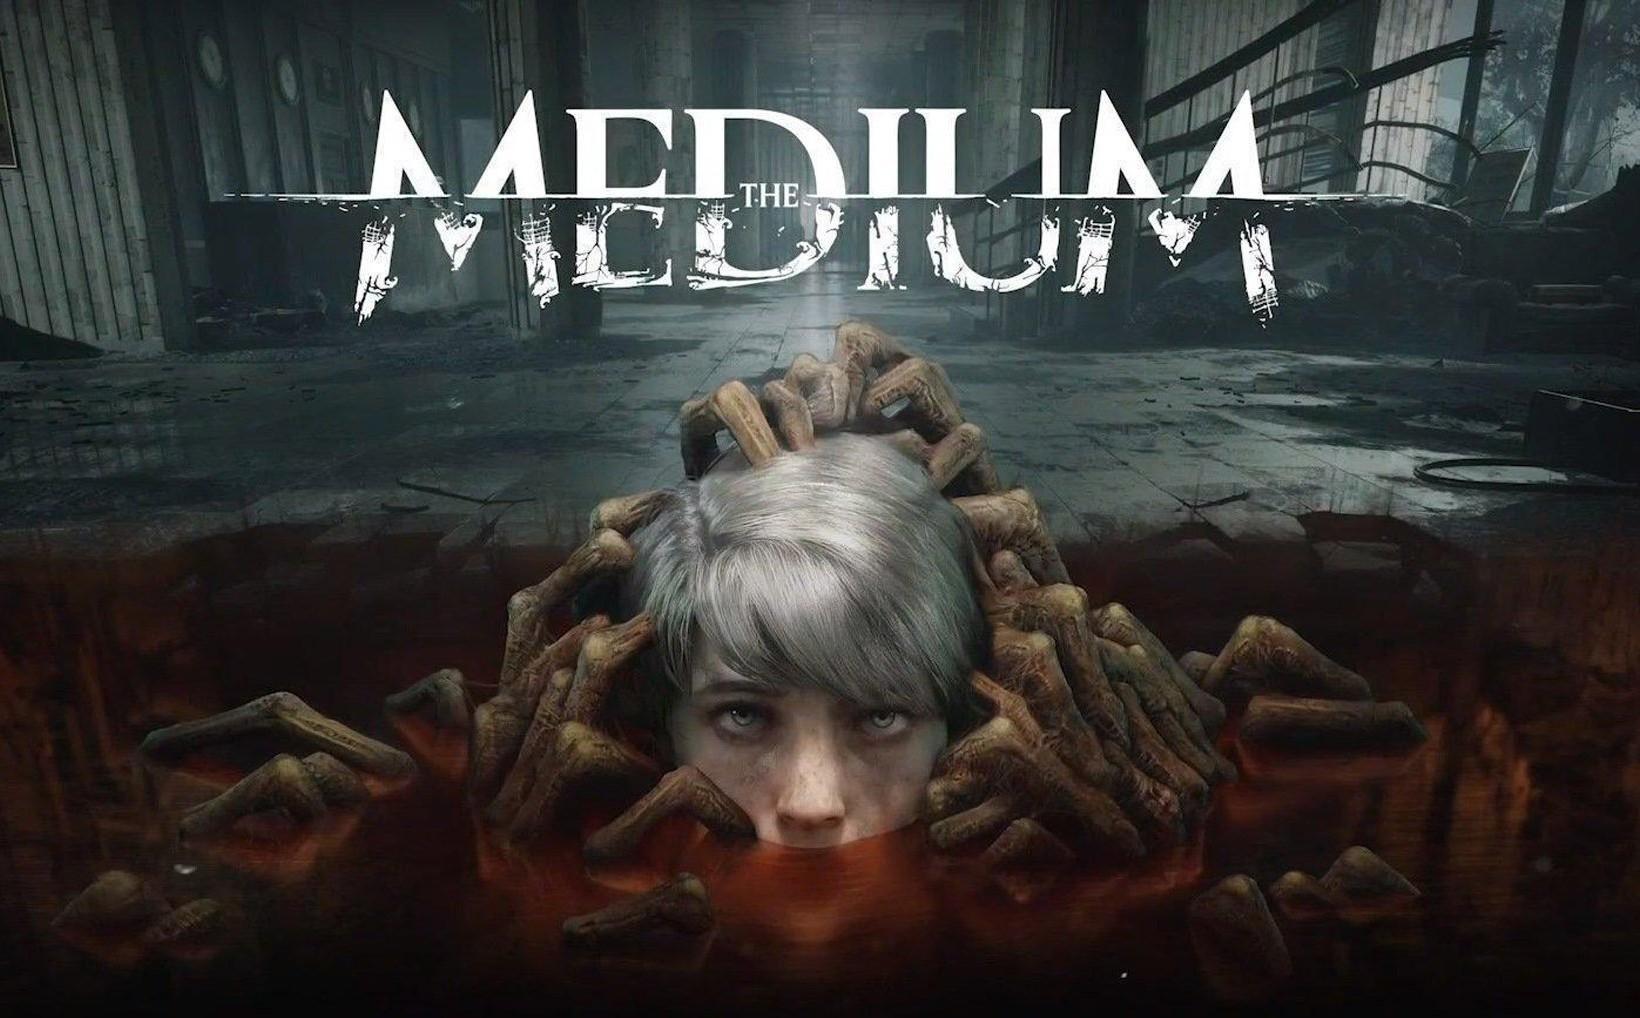 Трейлер к релизу The Medium под музыку Акиры Ямаоки и вокал Мэри Элизабет Макглинн 2